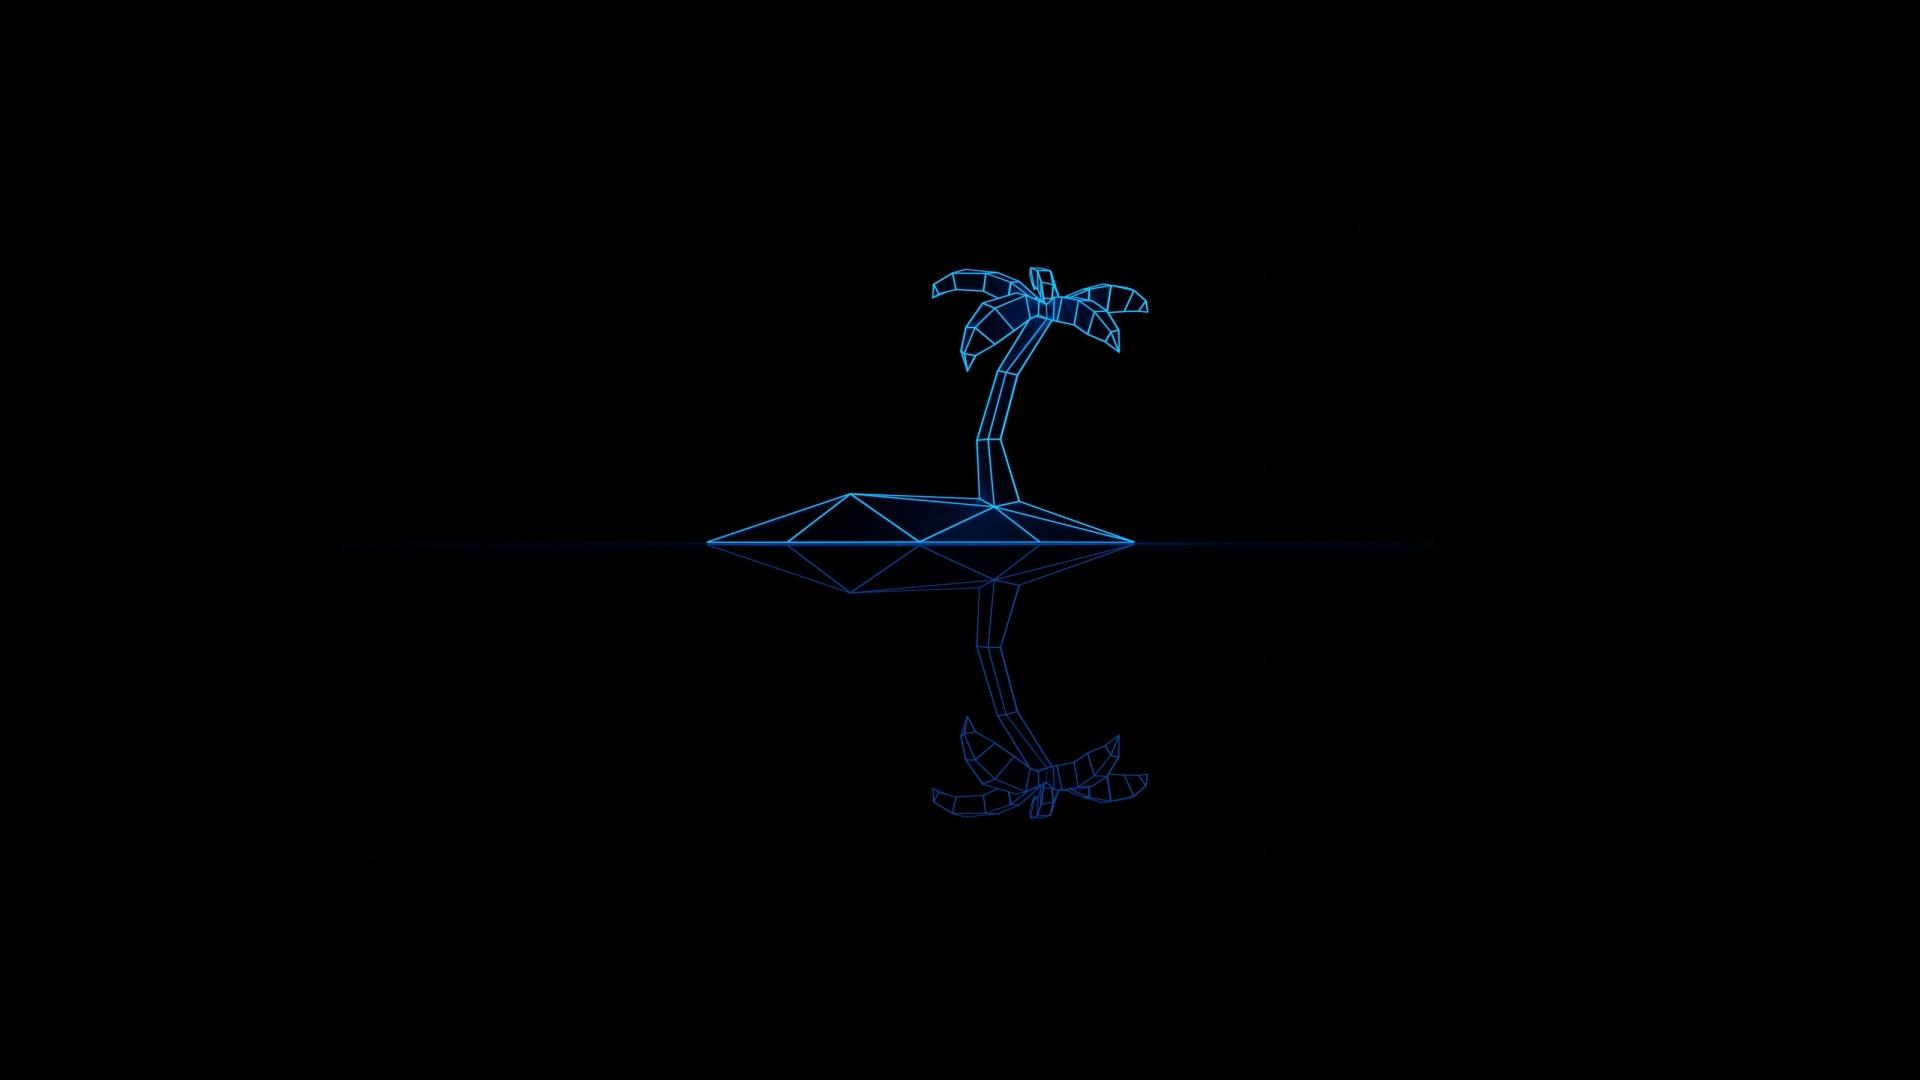 1920x1080 Synthwave Dark Minimal Art 1080p Laptop Full Hd